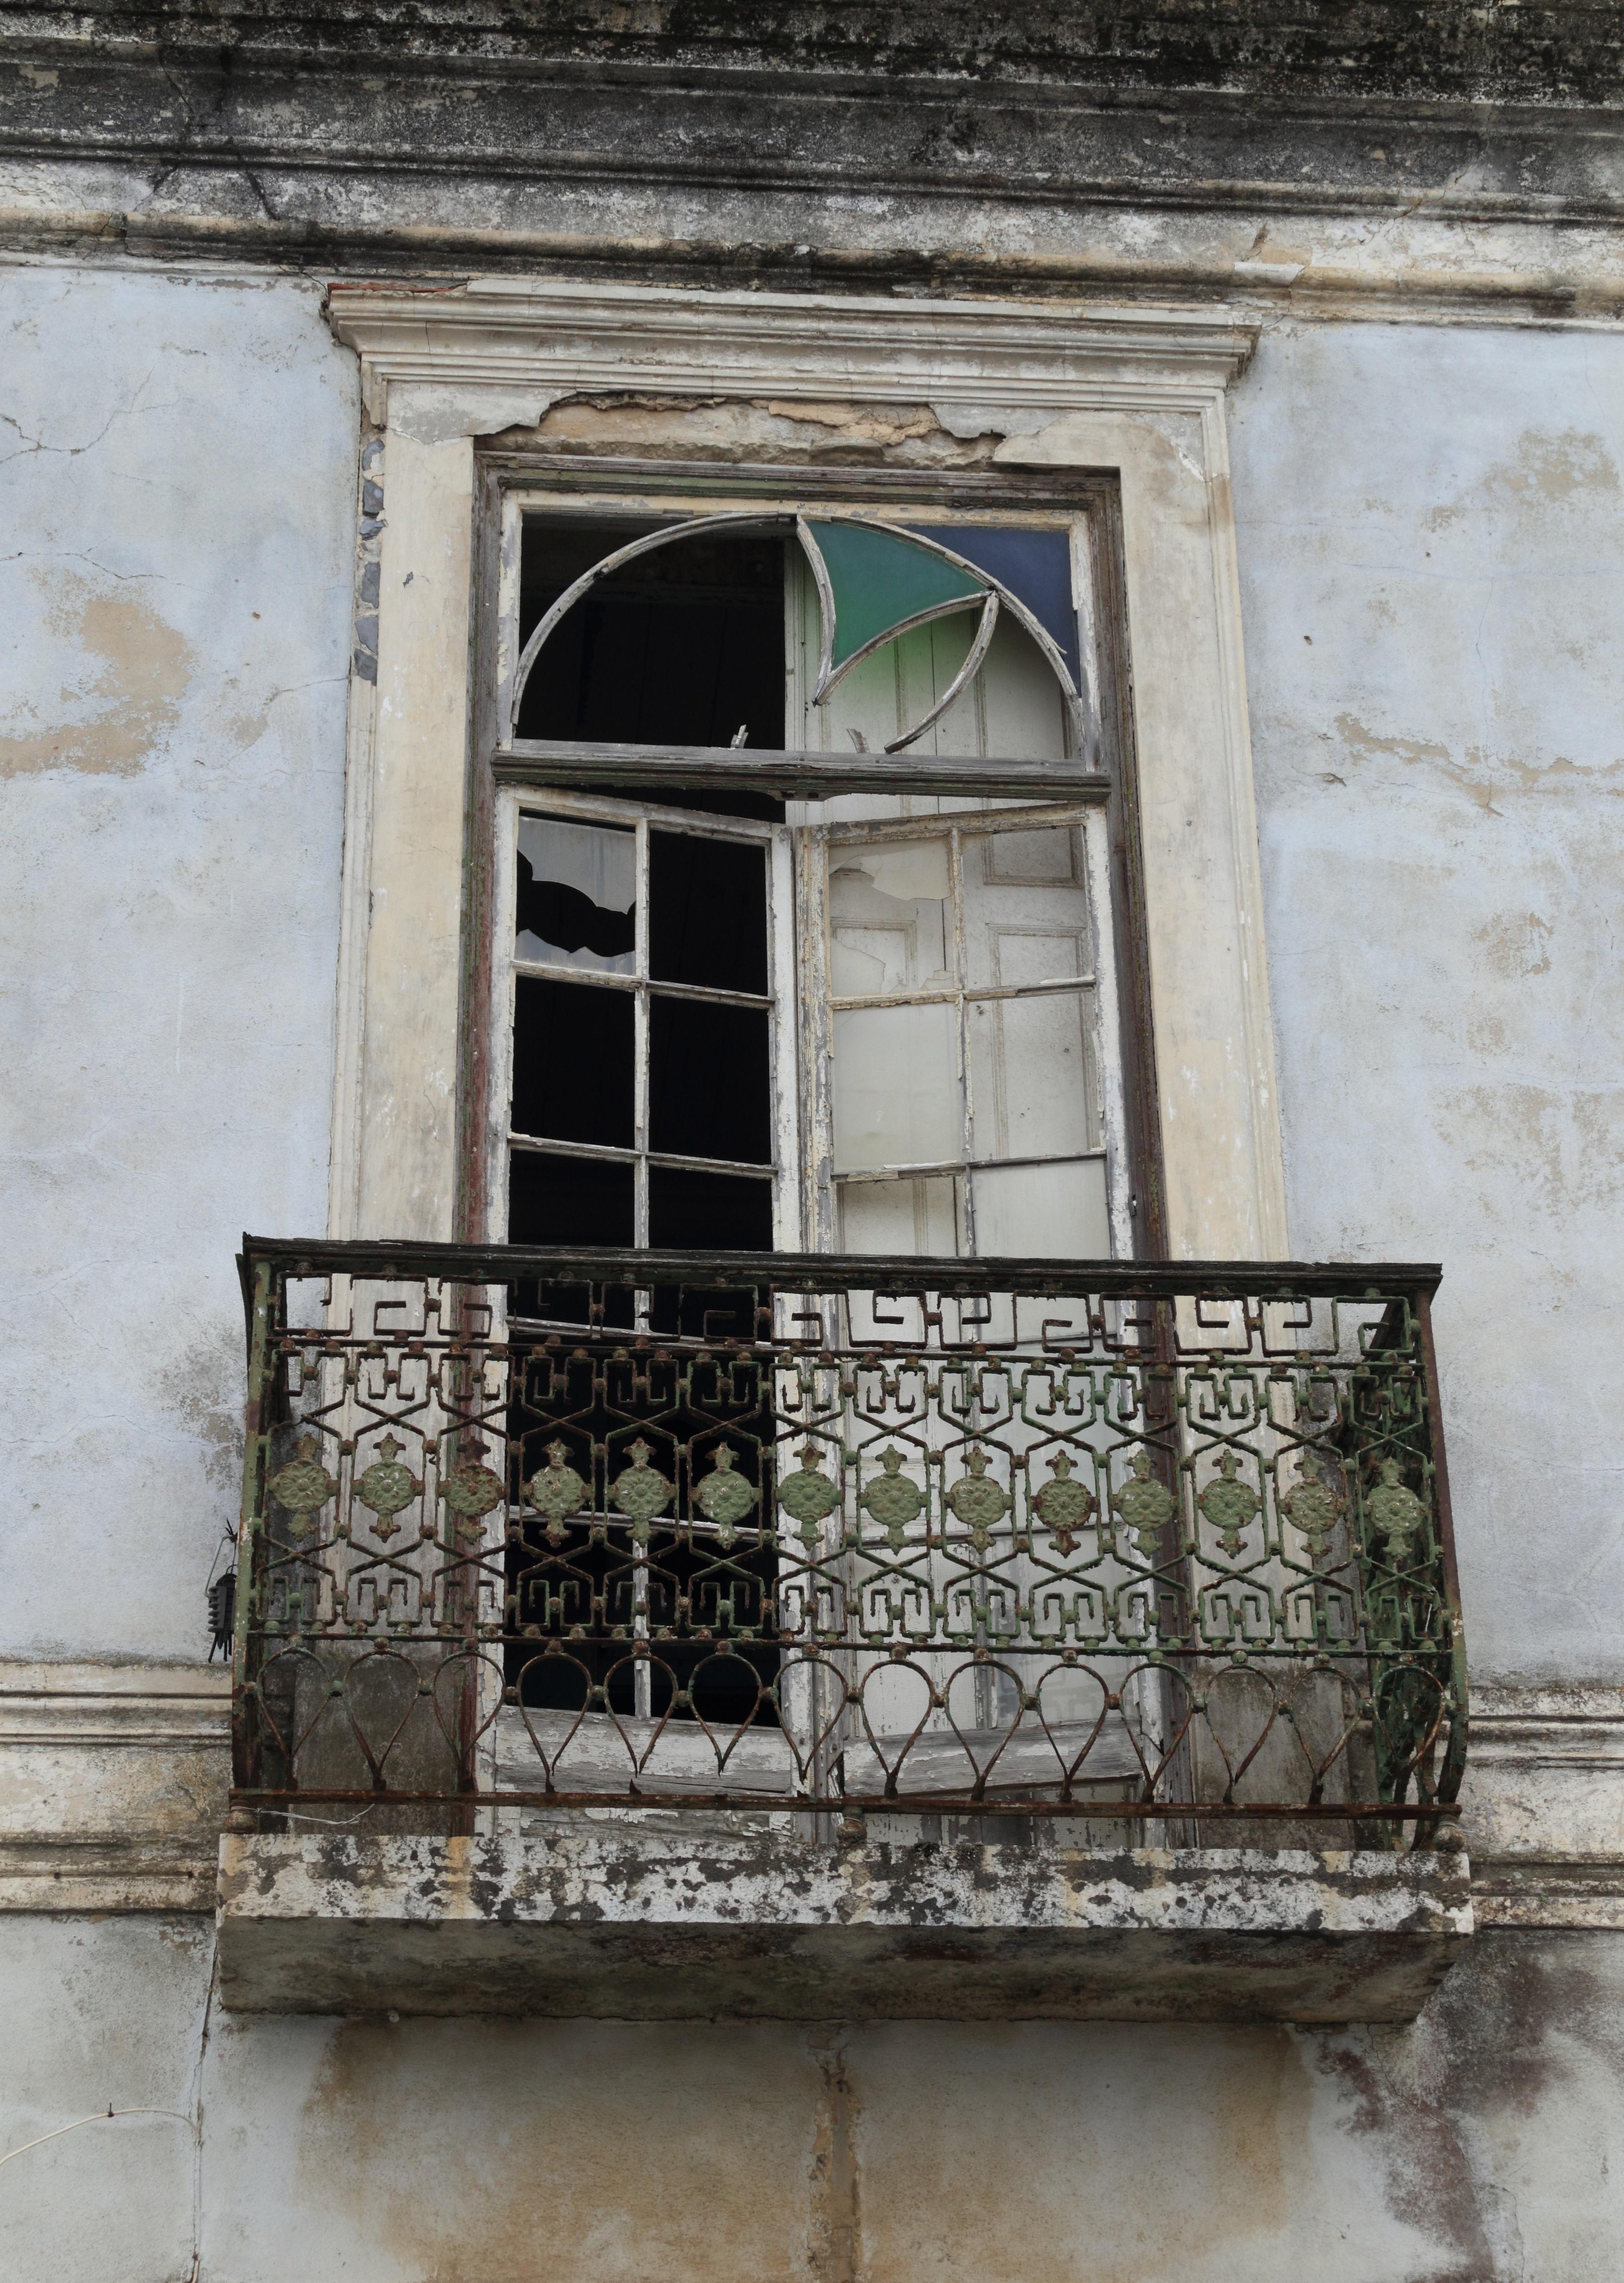 Fotos Gratis Arquitectura Madera Casa Ventana